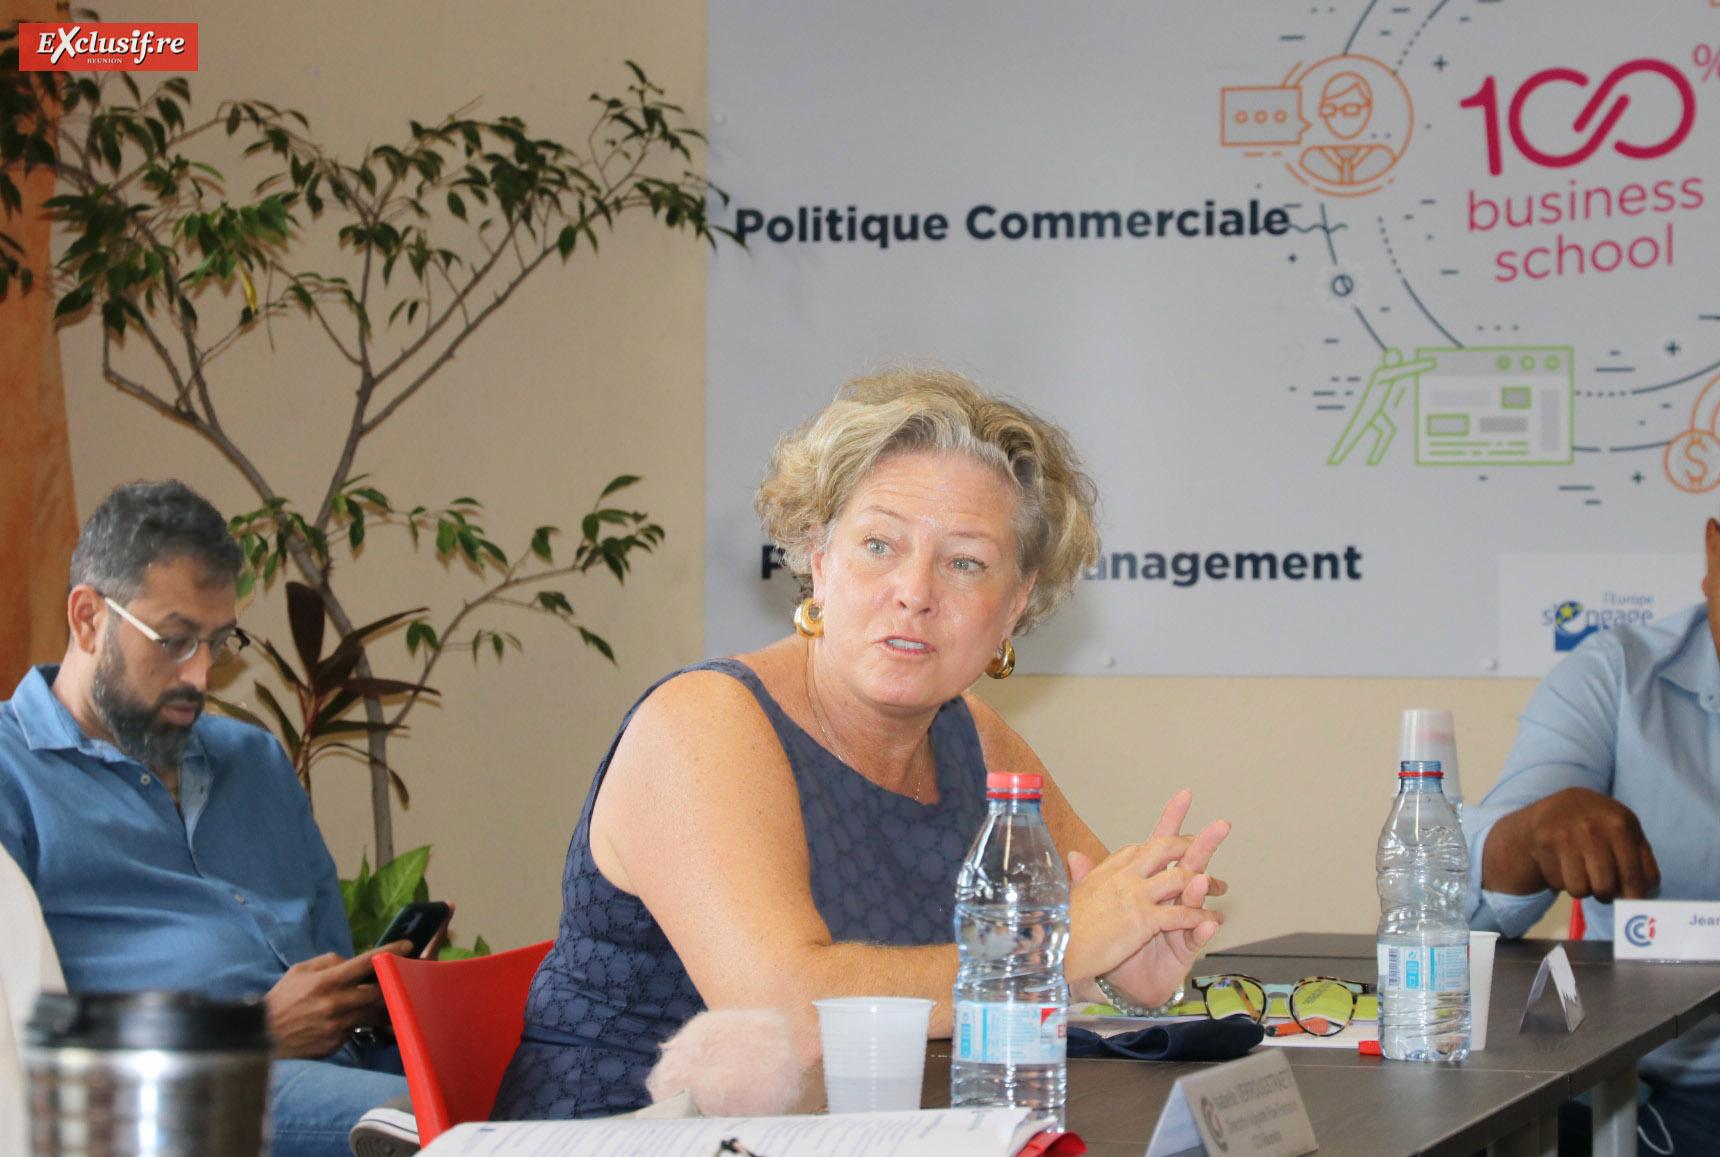 Marie-Claude de Munari, directrice Pôle formation à la CCIR